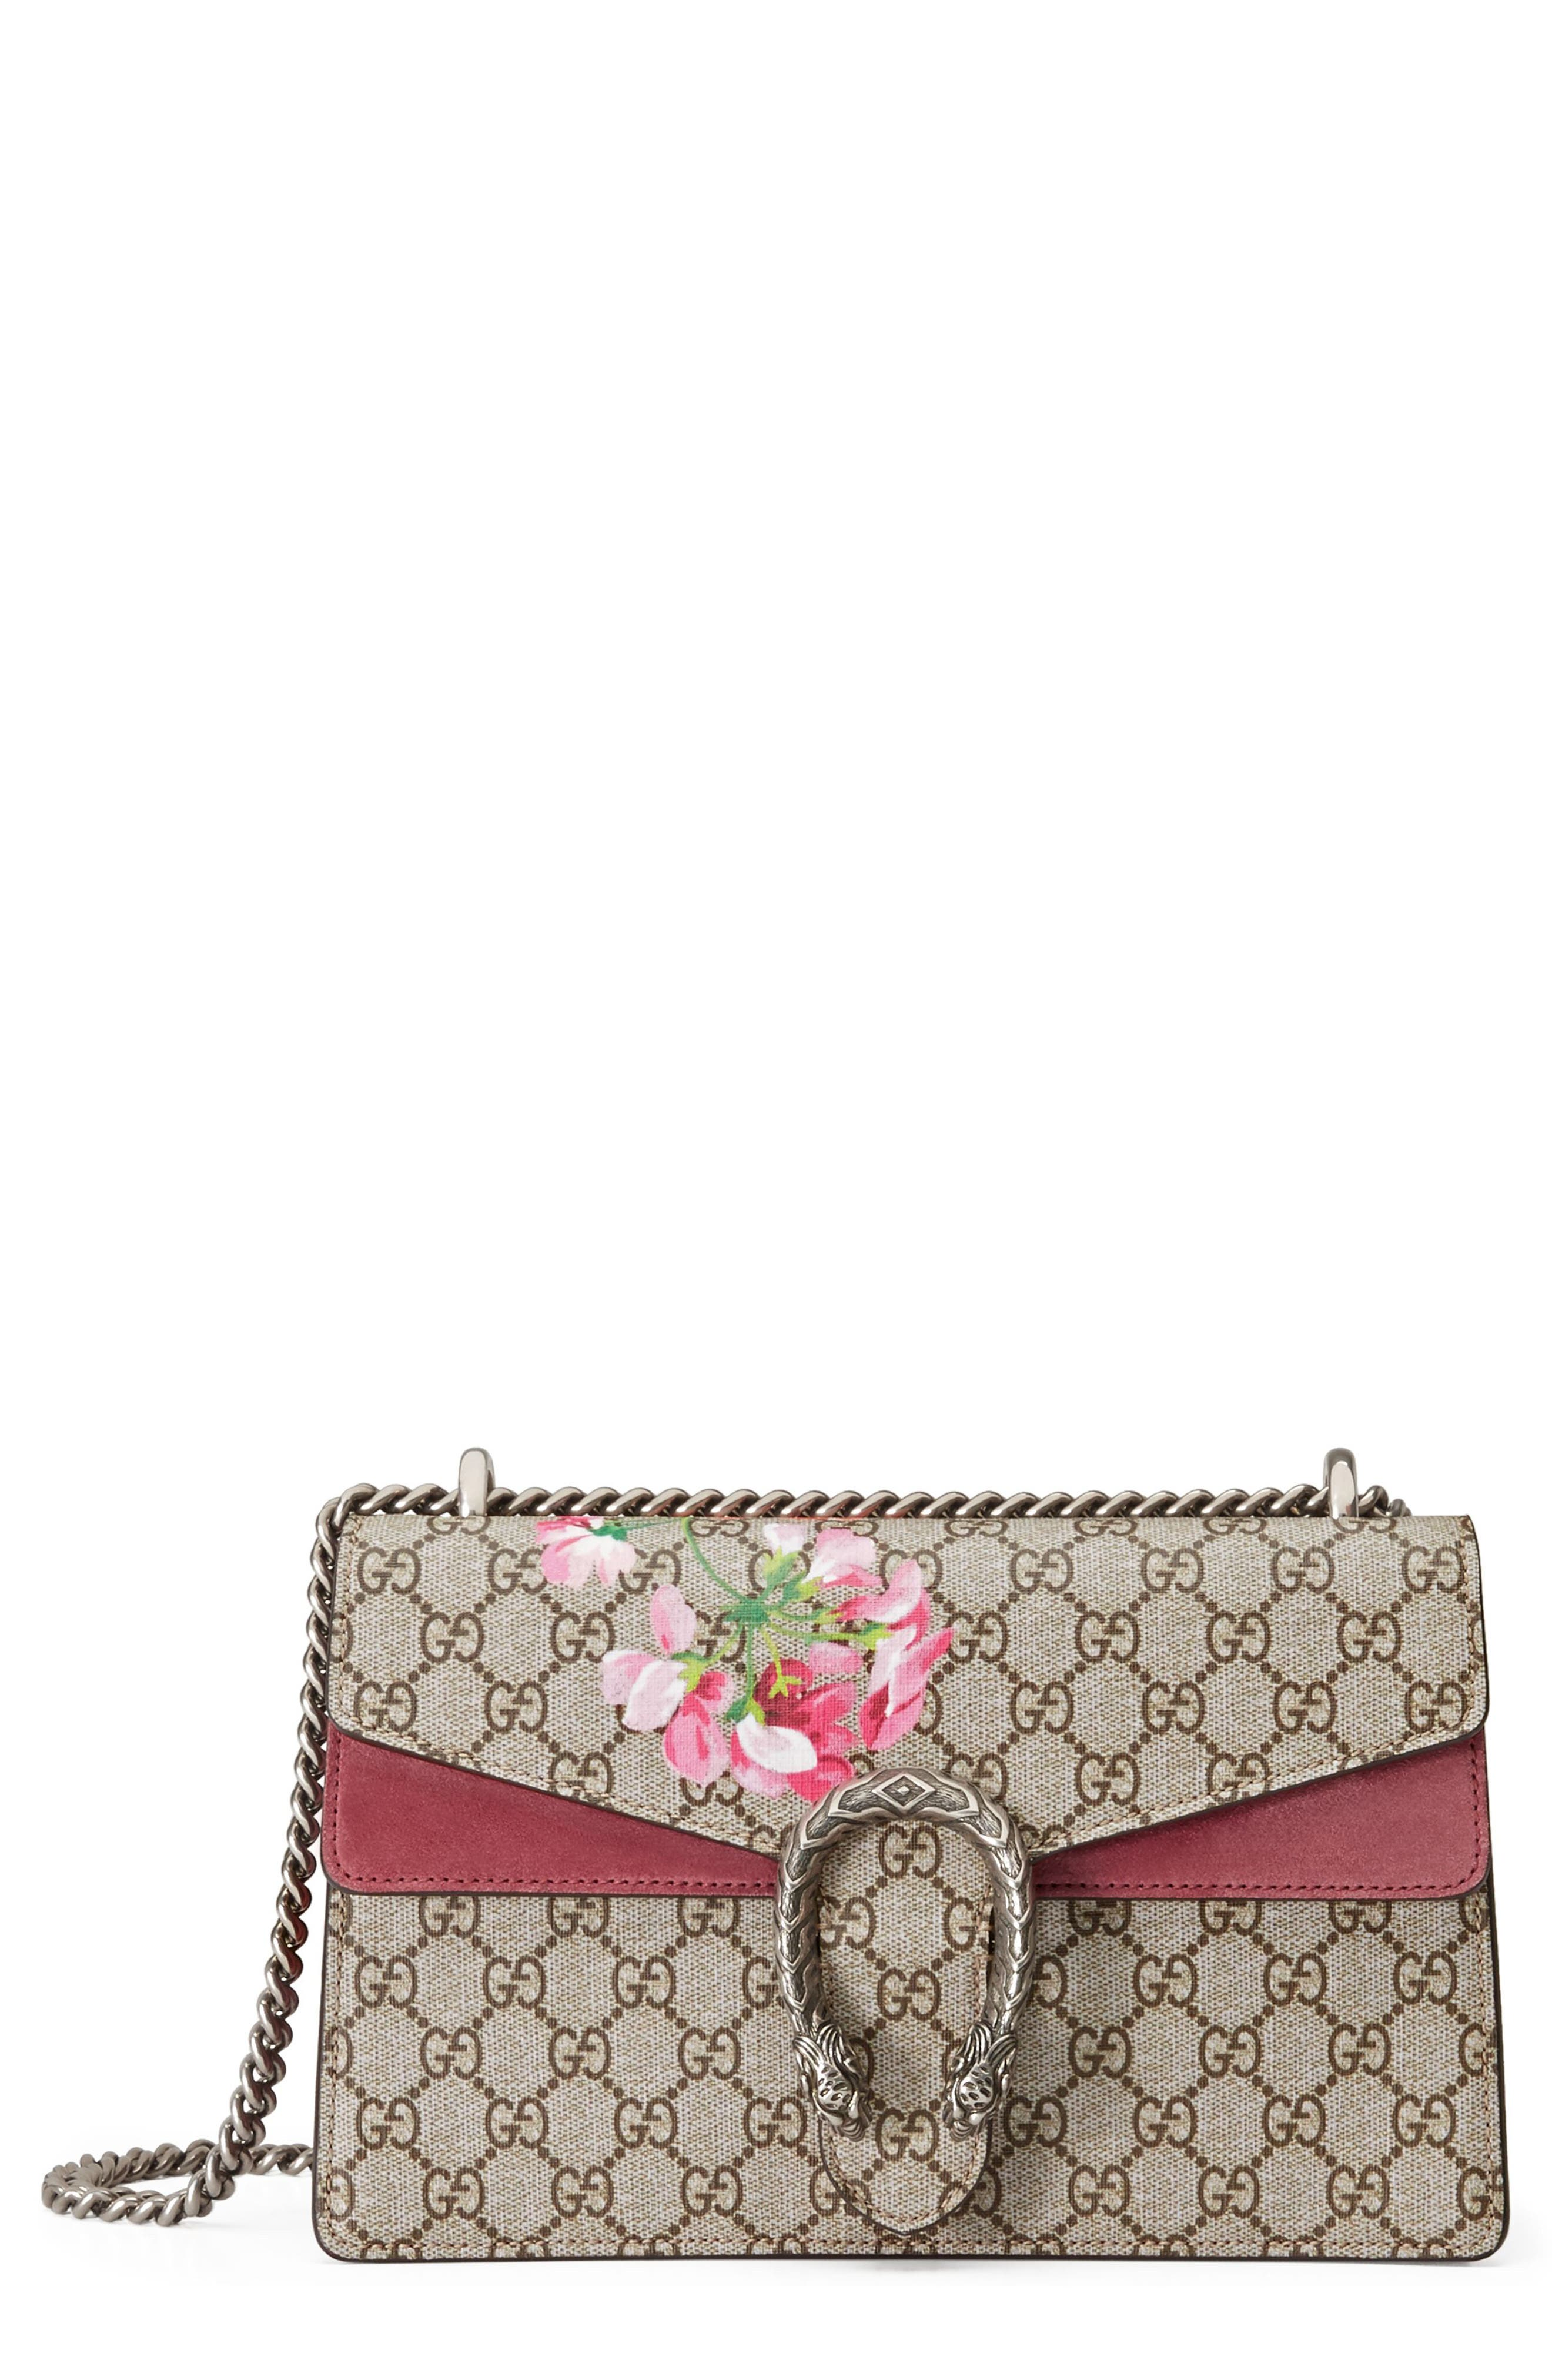 Small Dionysus Floral GG Supreme Canvas Shoulder Bag,                             Main thumbnail 1, color,                             Beige Ebony/ Dry Rose